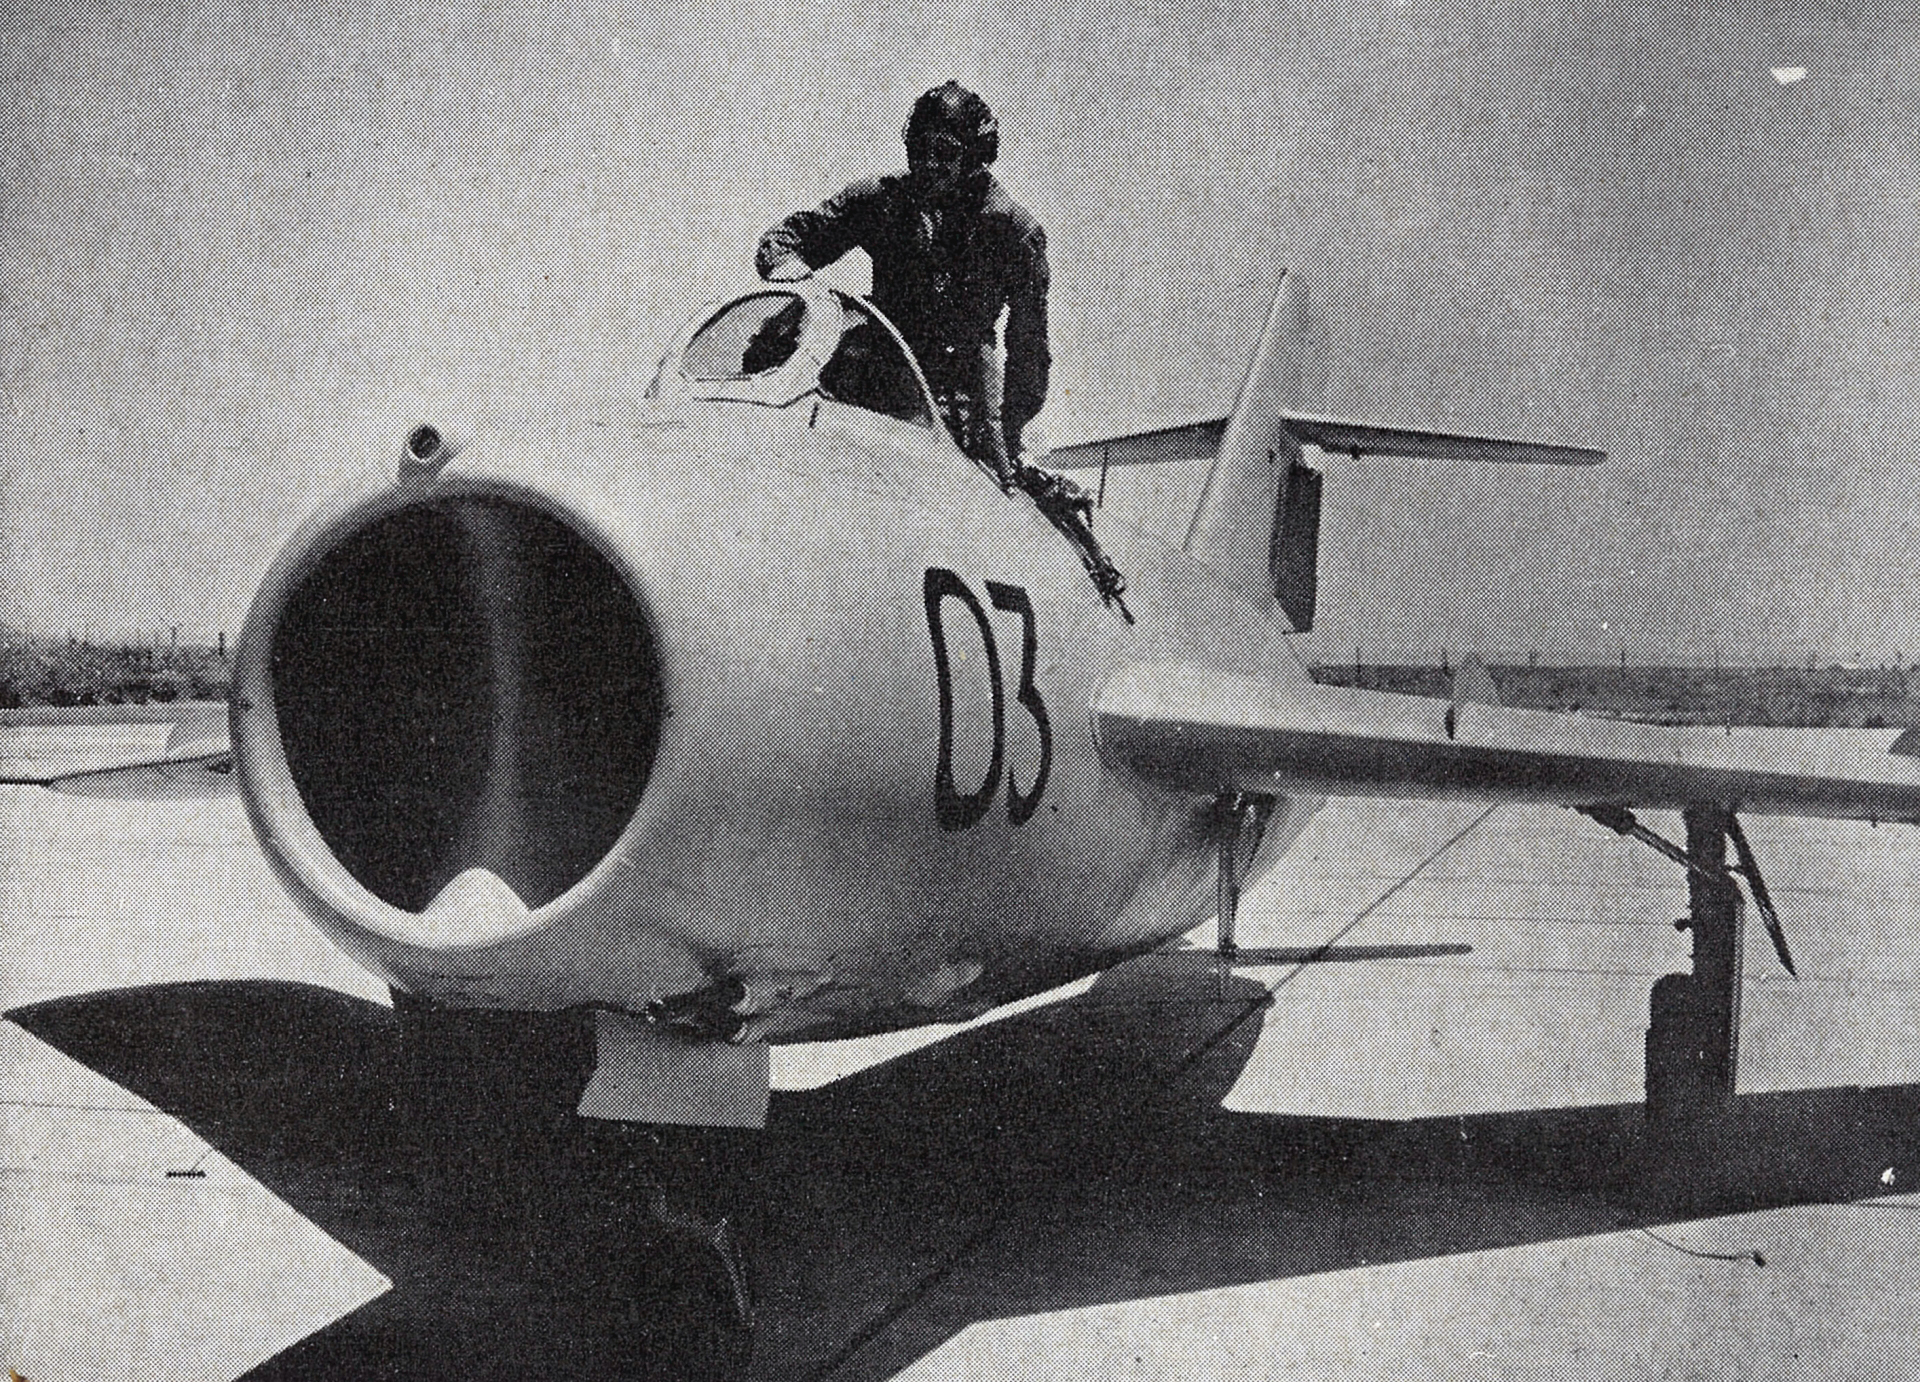 Histoire des Forces Royales Air 31307742774_f46ec4d4d6_o